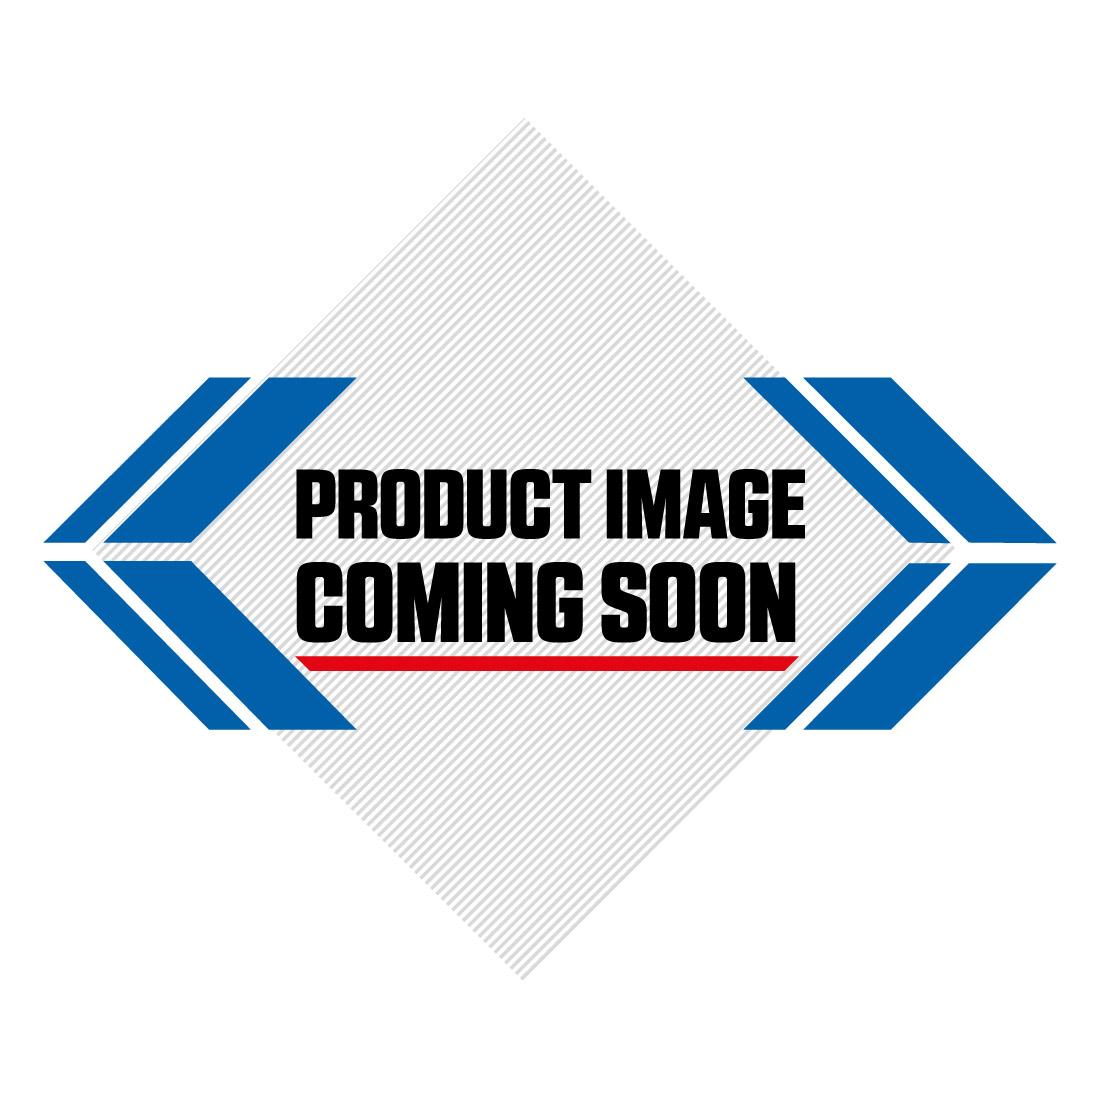 UFO Honda EVO Plastic Kit CR 500 (91-94) OEM Factory Image-1>